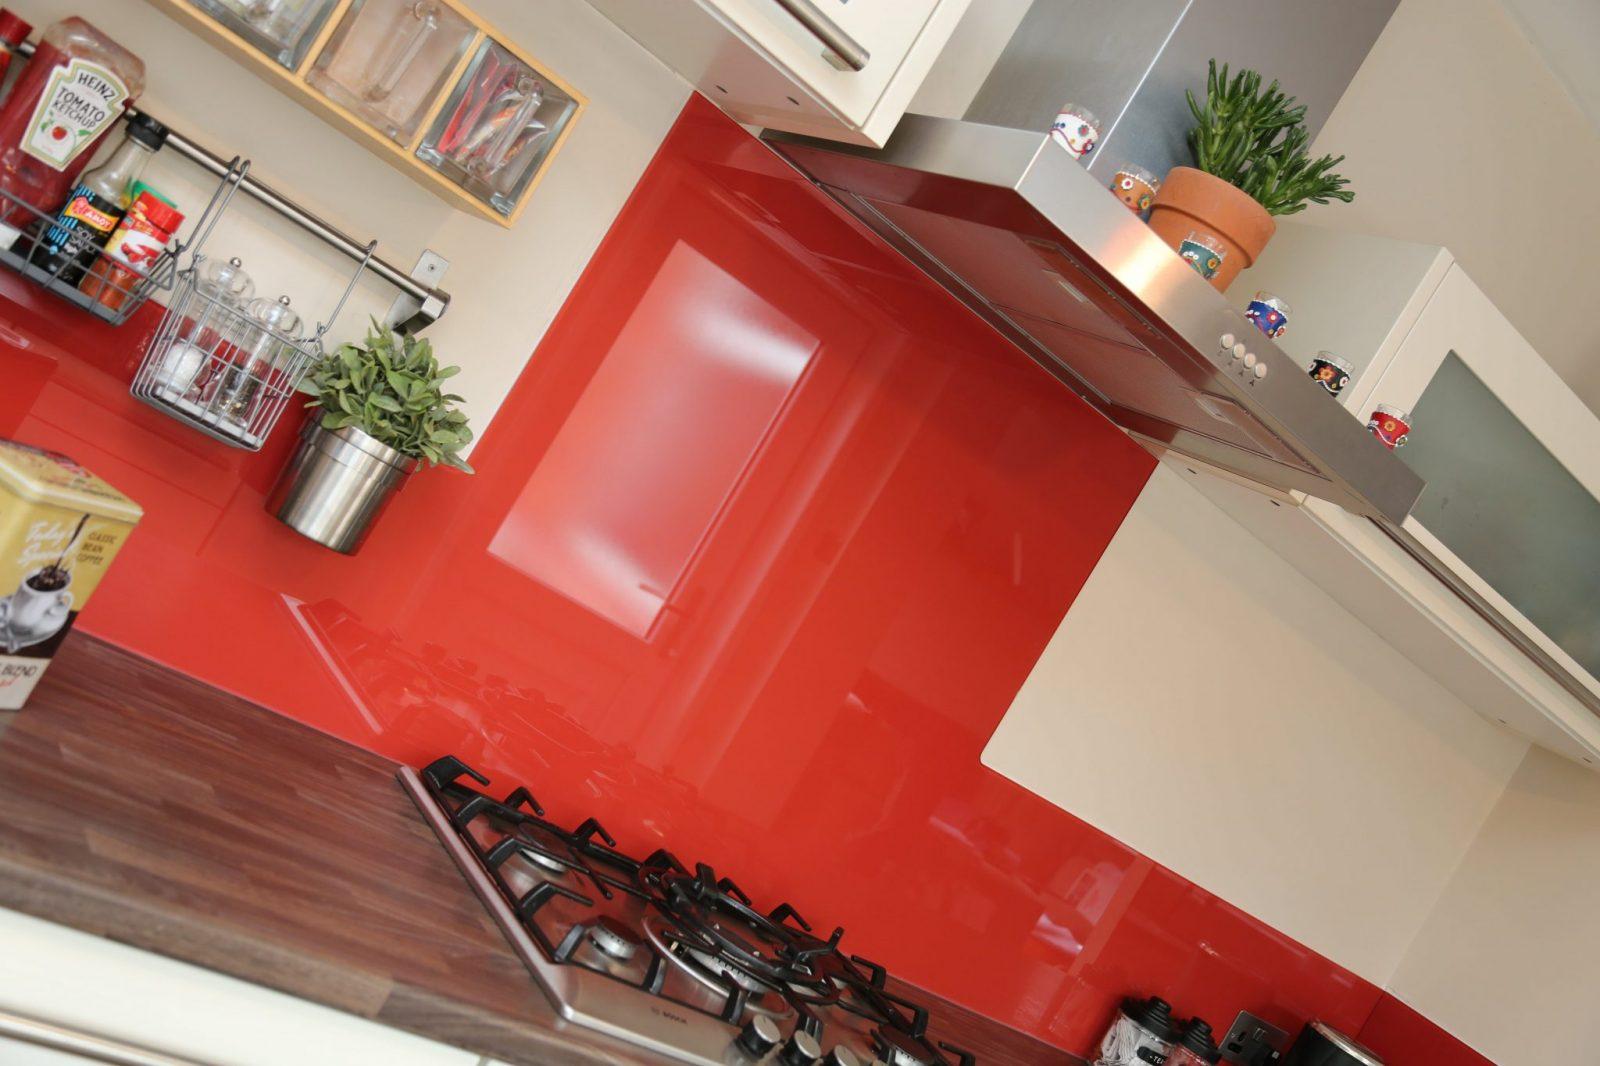 Full Application Glass Splashback In Modern Kitchen